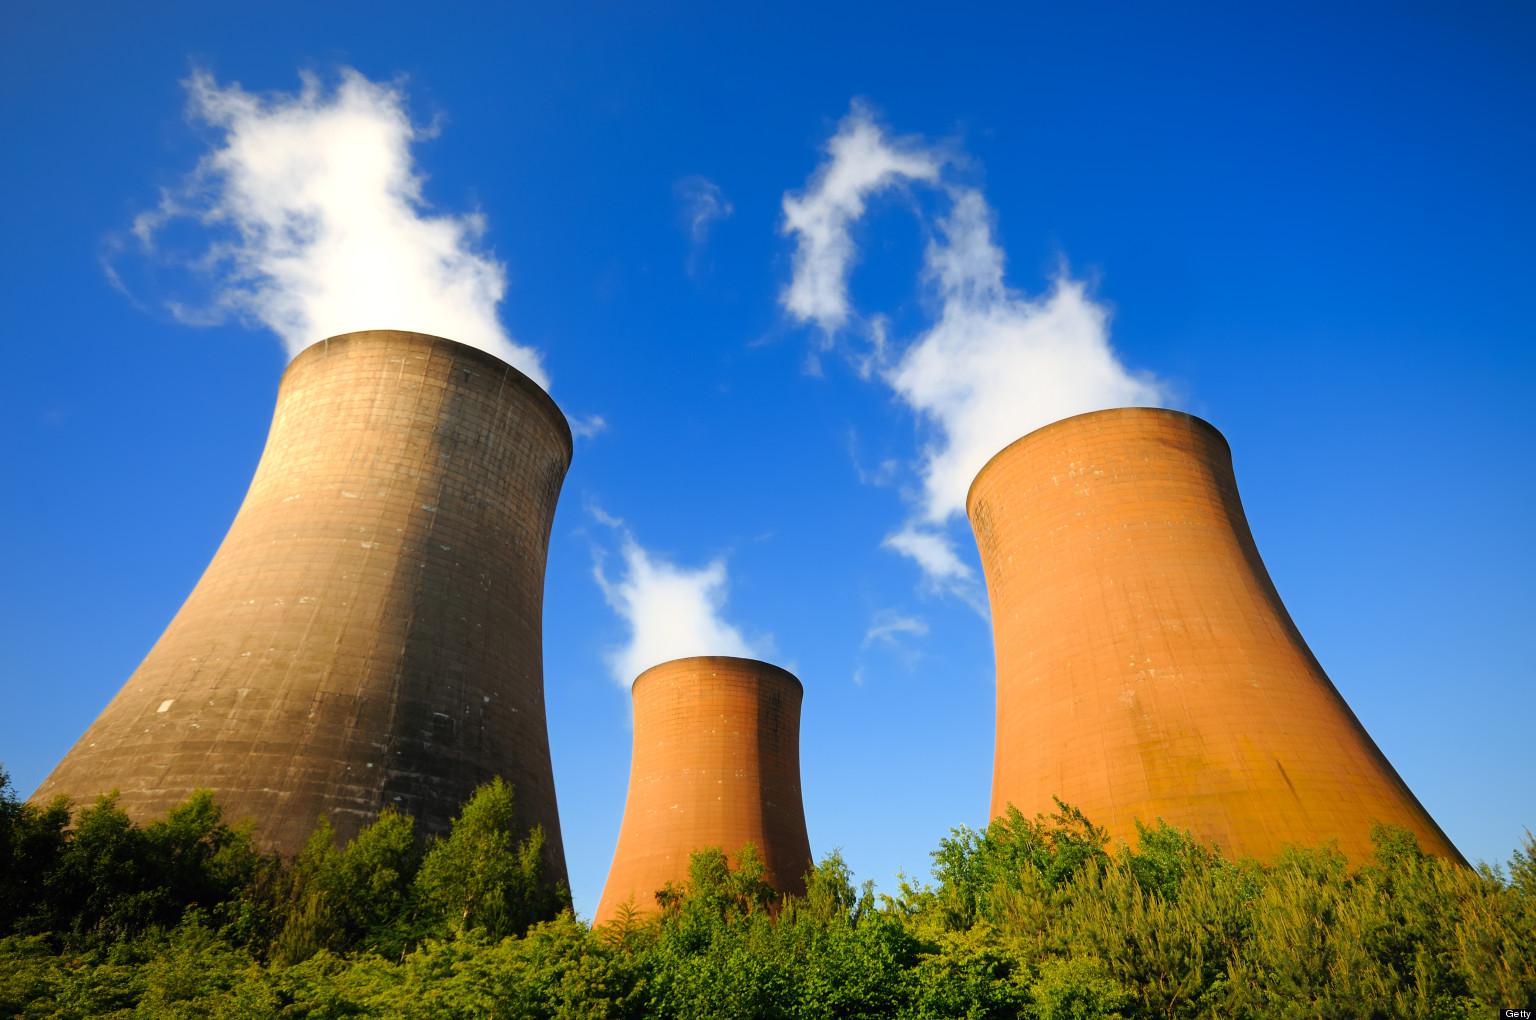 When will Australia consider nuclear energy?